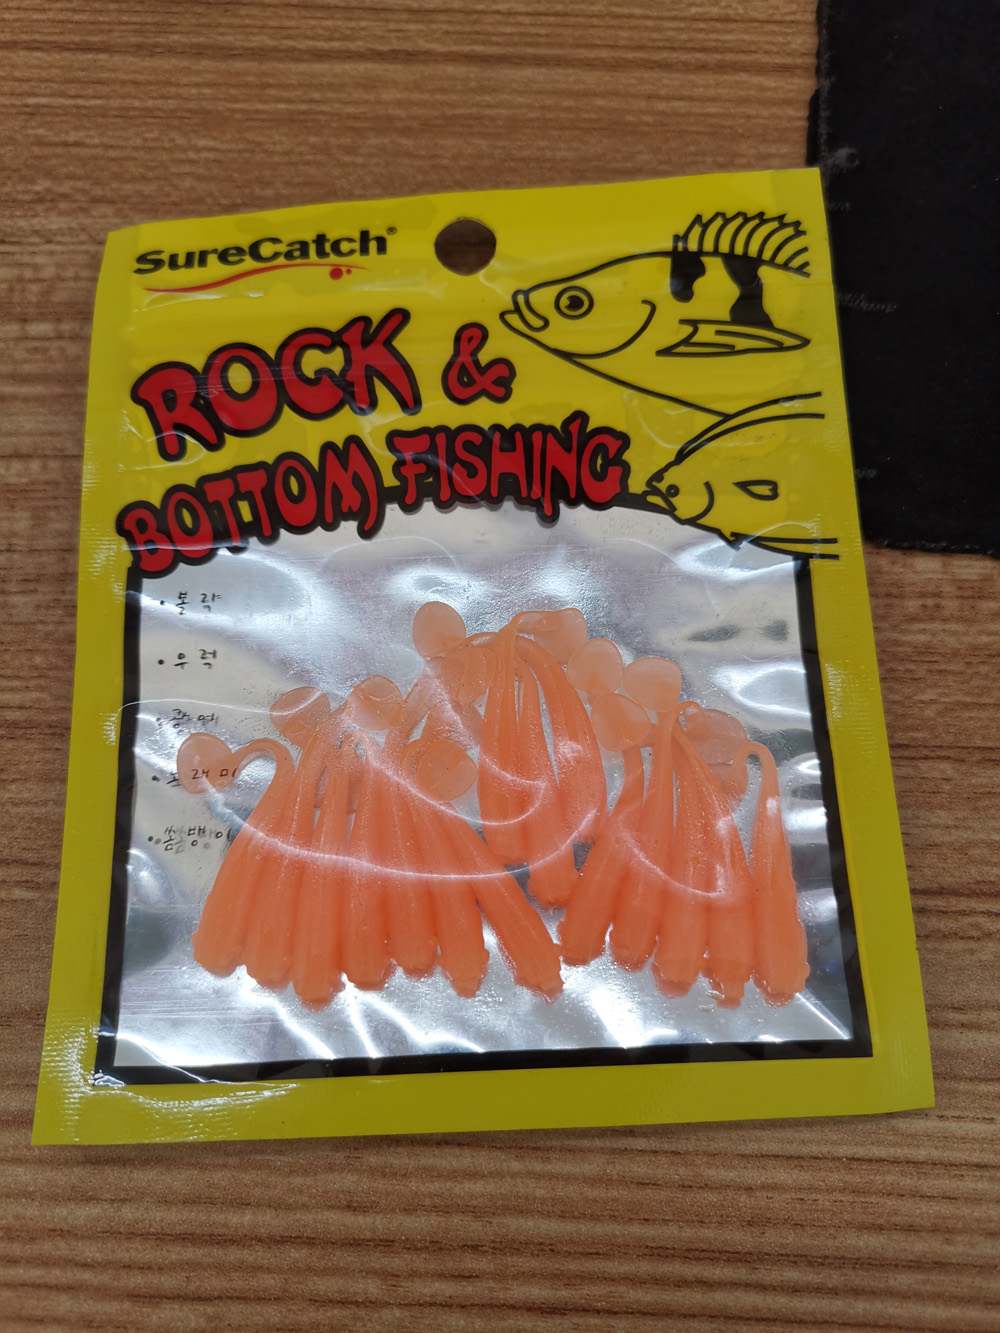 BassLegend - Soft Plastic Fishing Mini Grubs Tiny Shining Worms Bass Pike Trout 50mm/0.9g 15 pcs